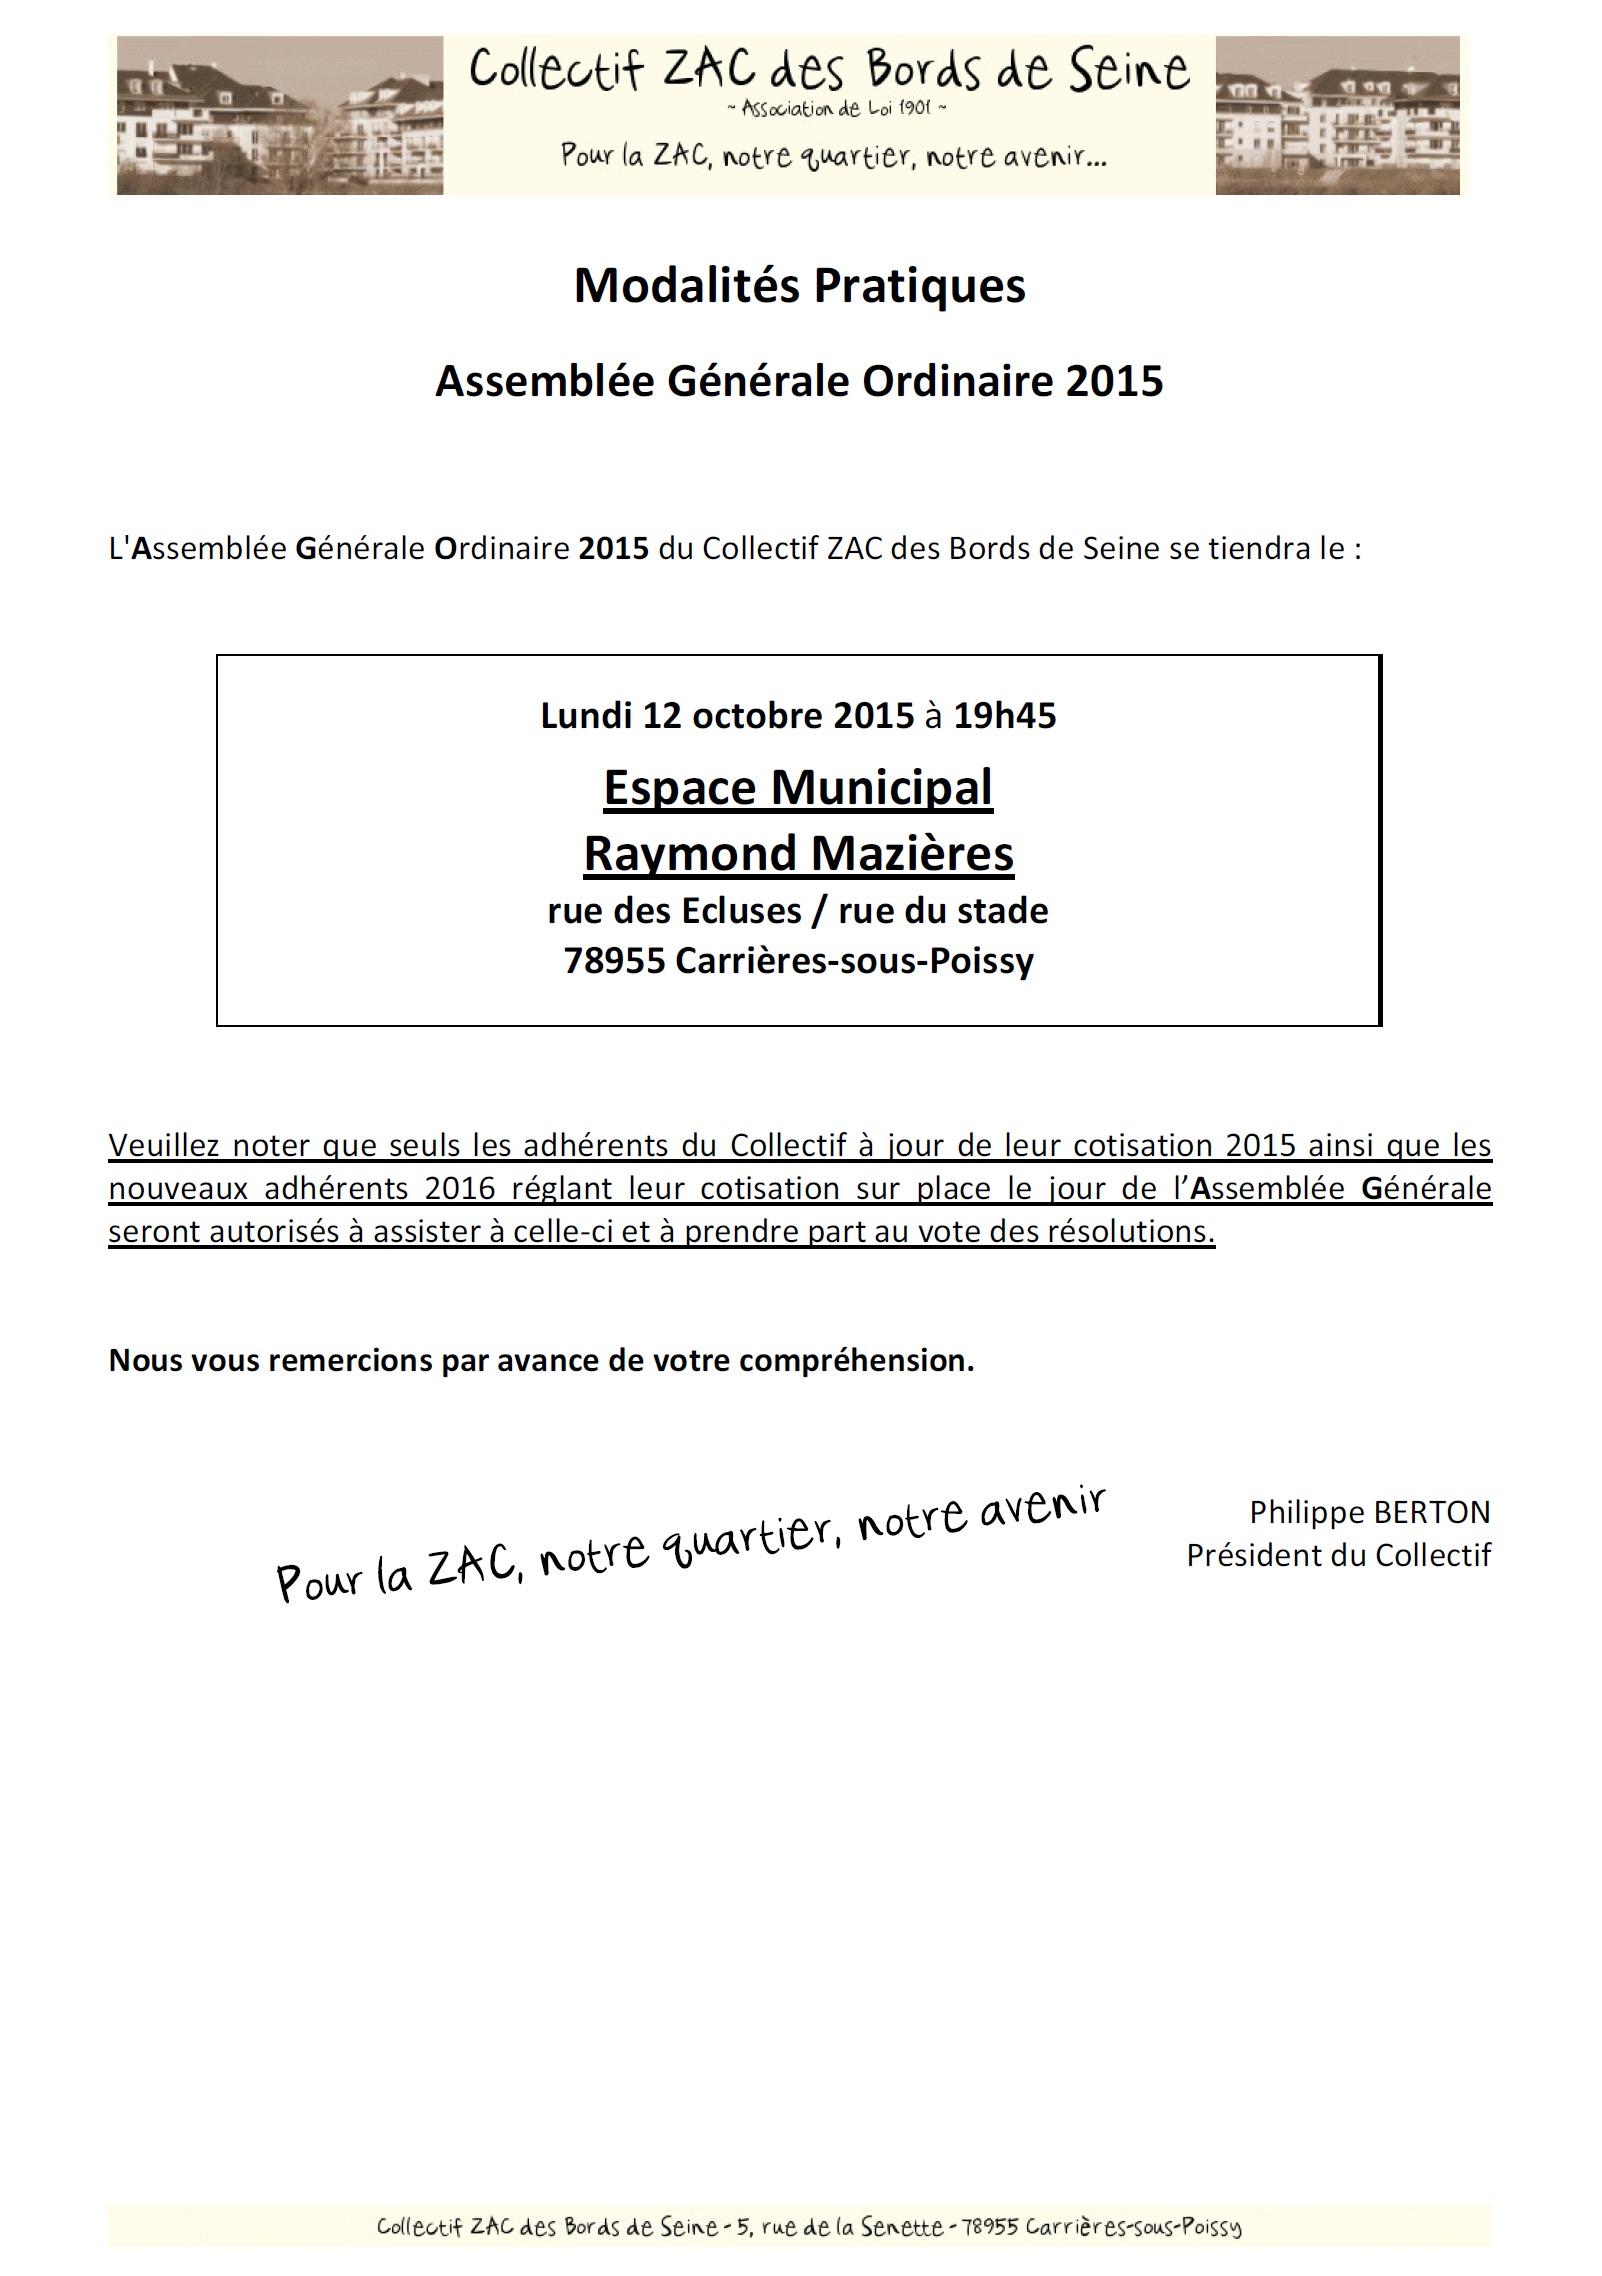 ModalitesPratiquesAG2015